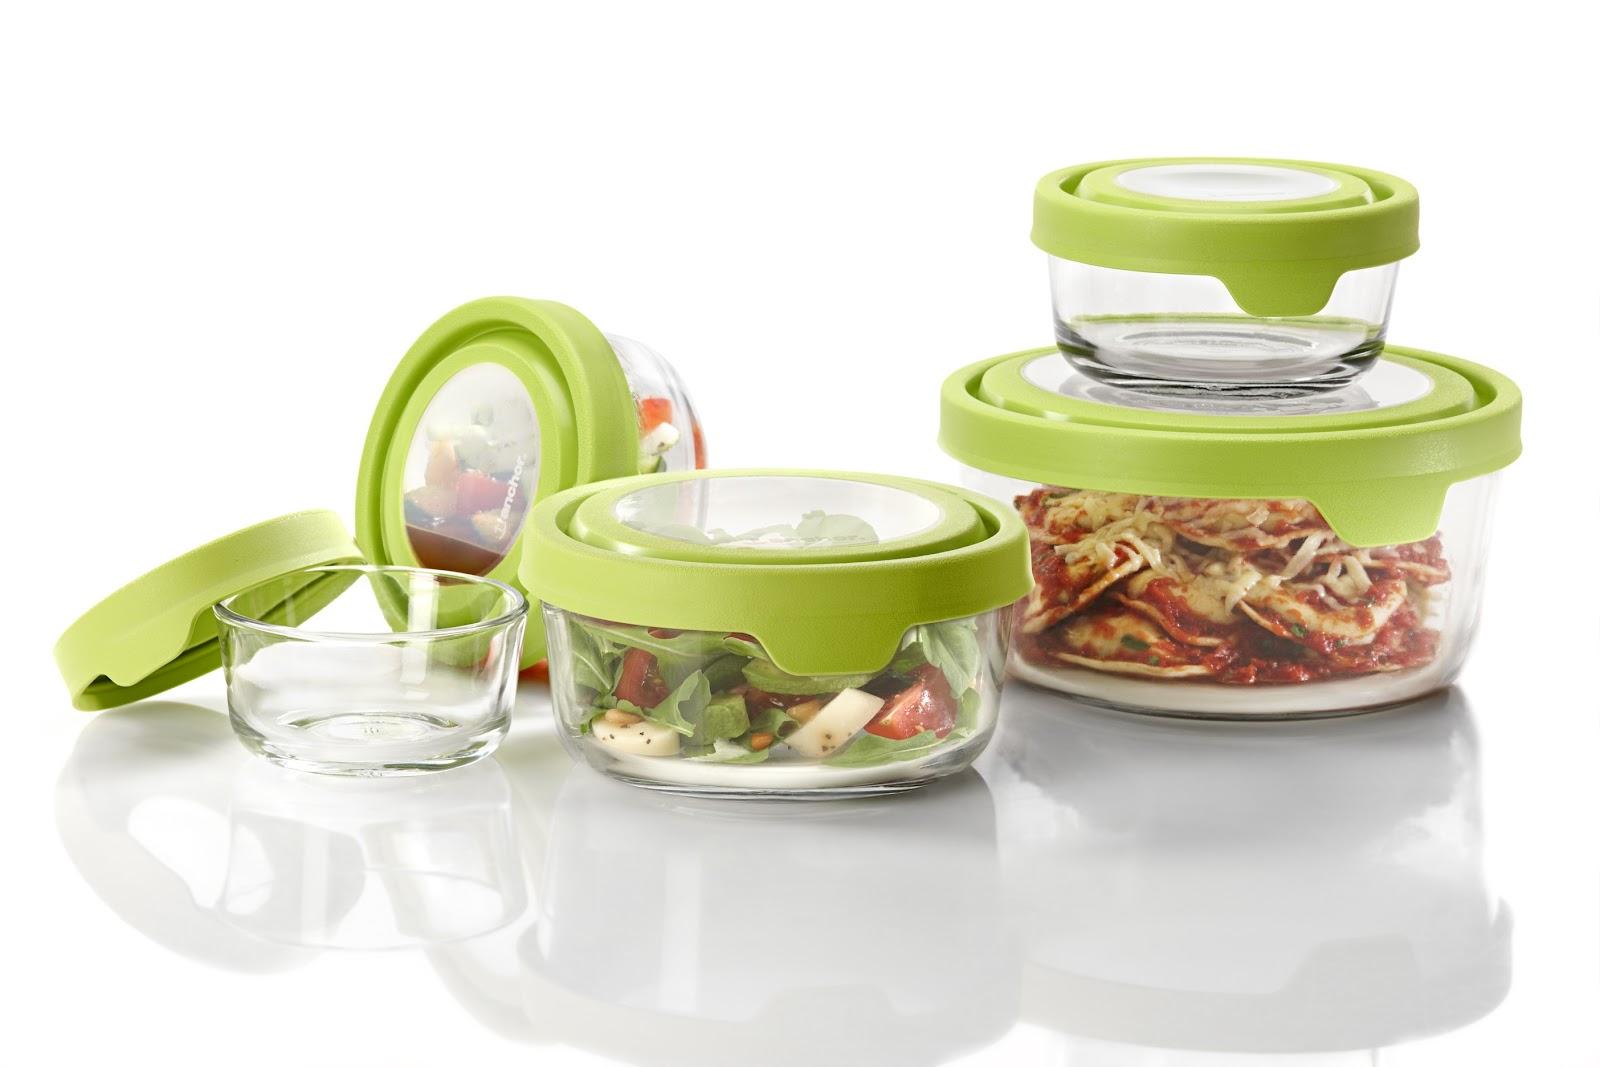 Cocina segura lonchera segura recipientes for Recipientes cocina